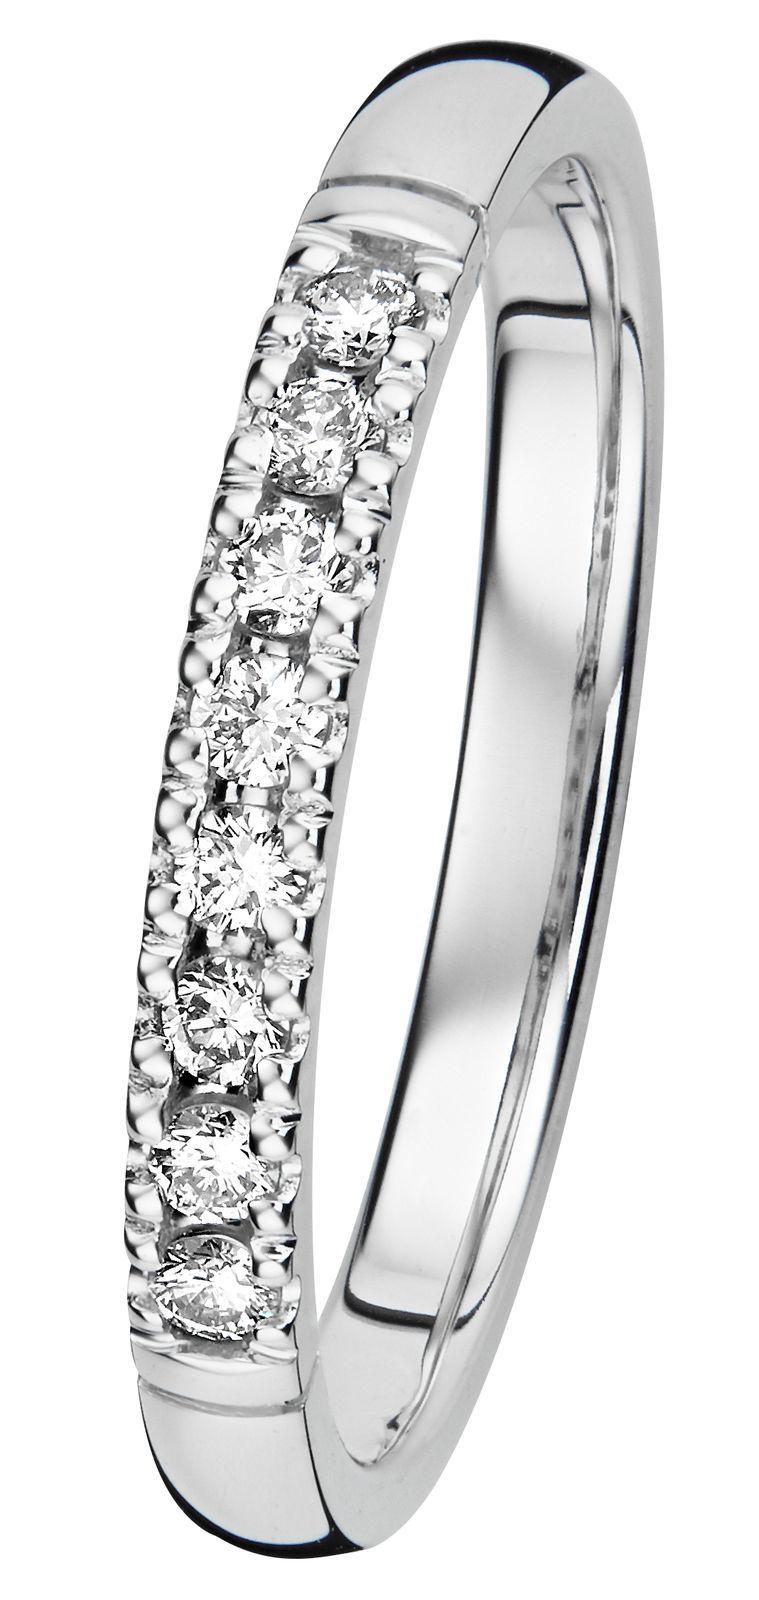 Kohinoor Estelle timanttisormus valkokulta 8 x 0,02 ct, 033-216V-16